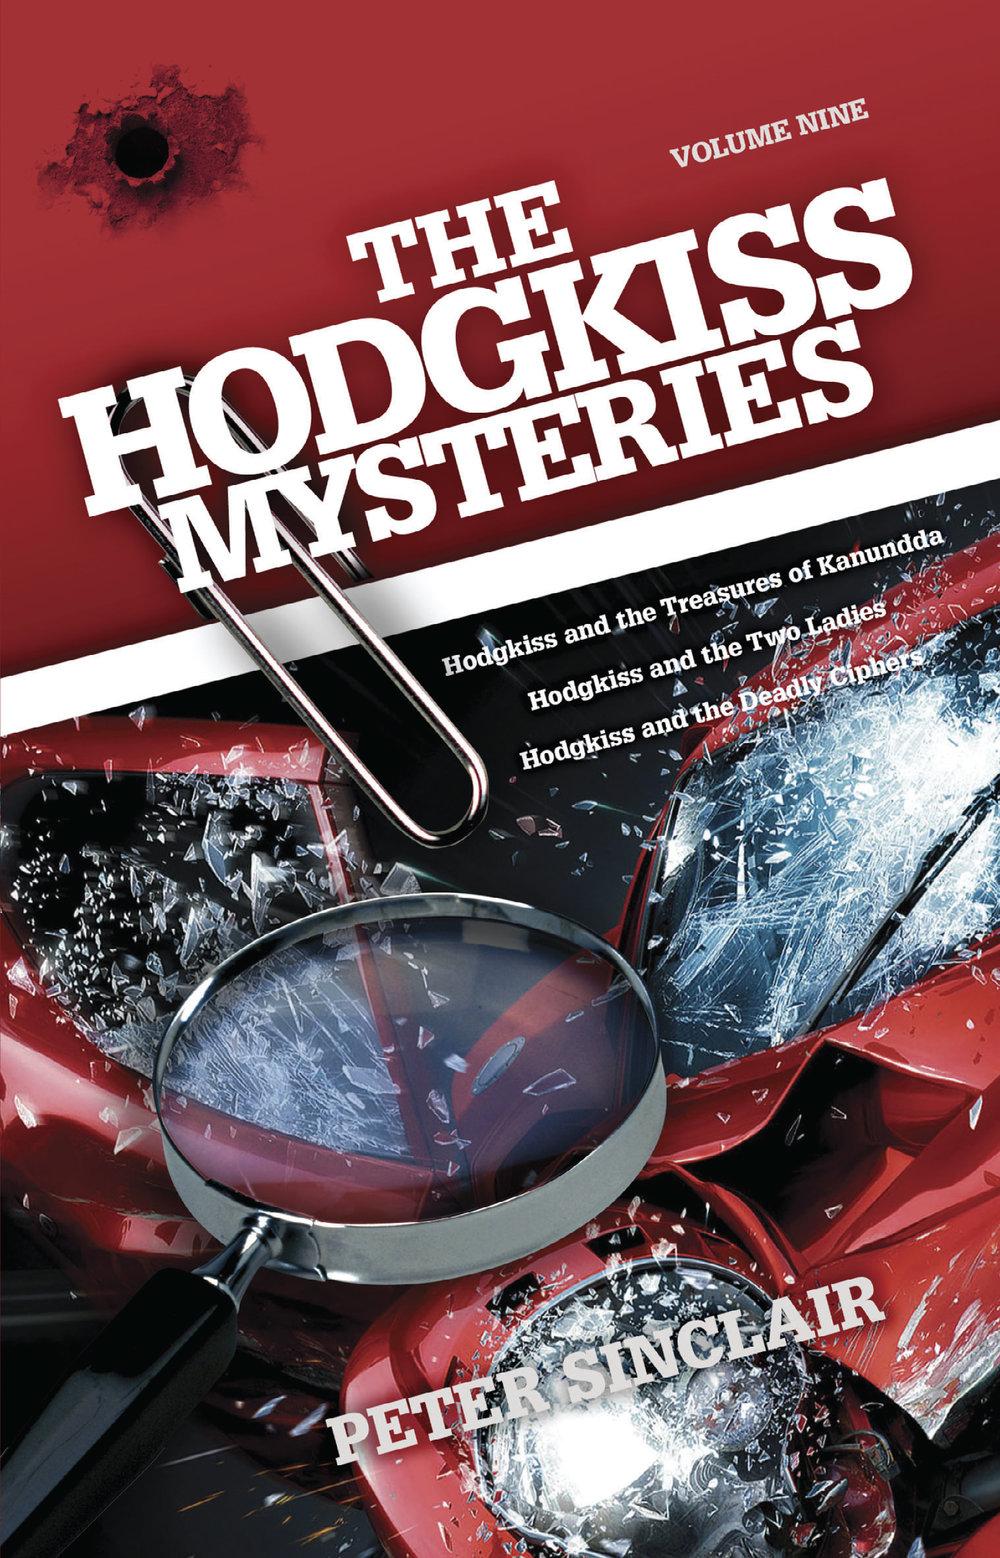 Hodgkiss Mysteries_cover_VOL IX.jpg